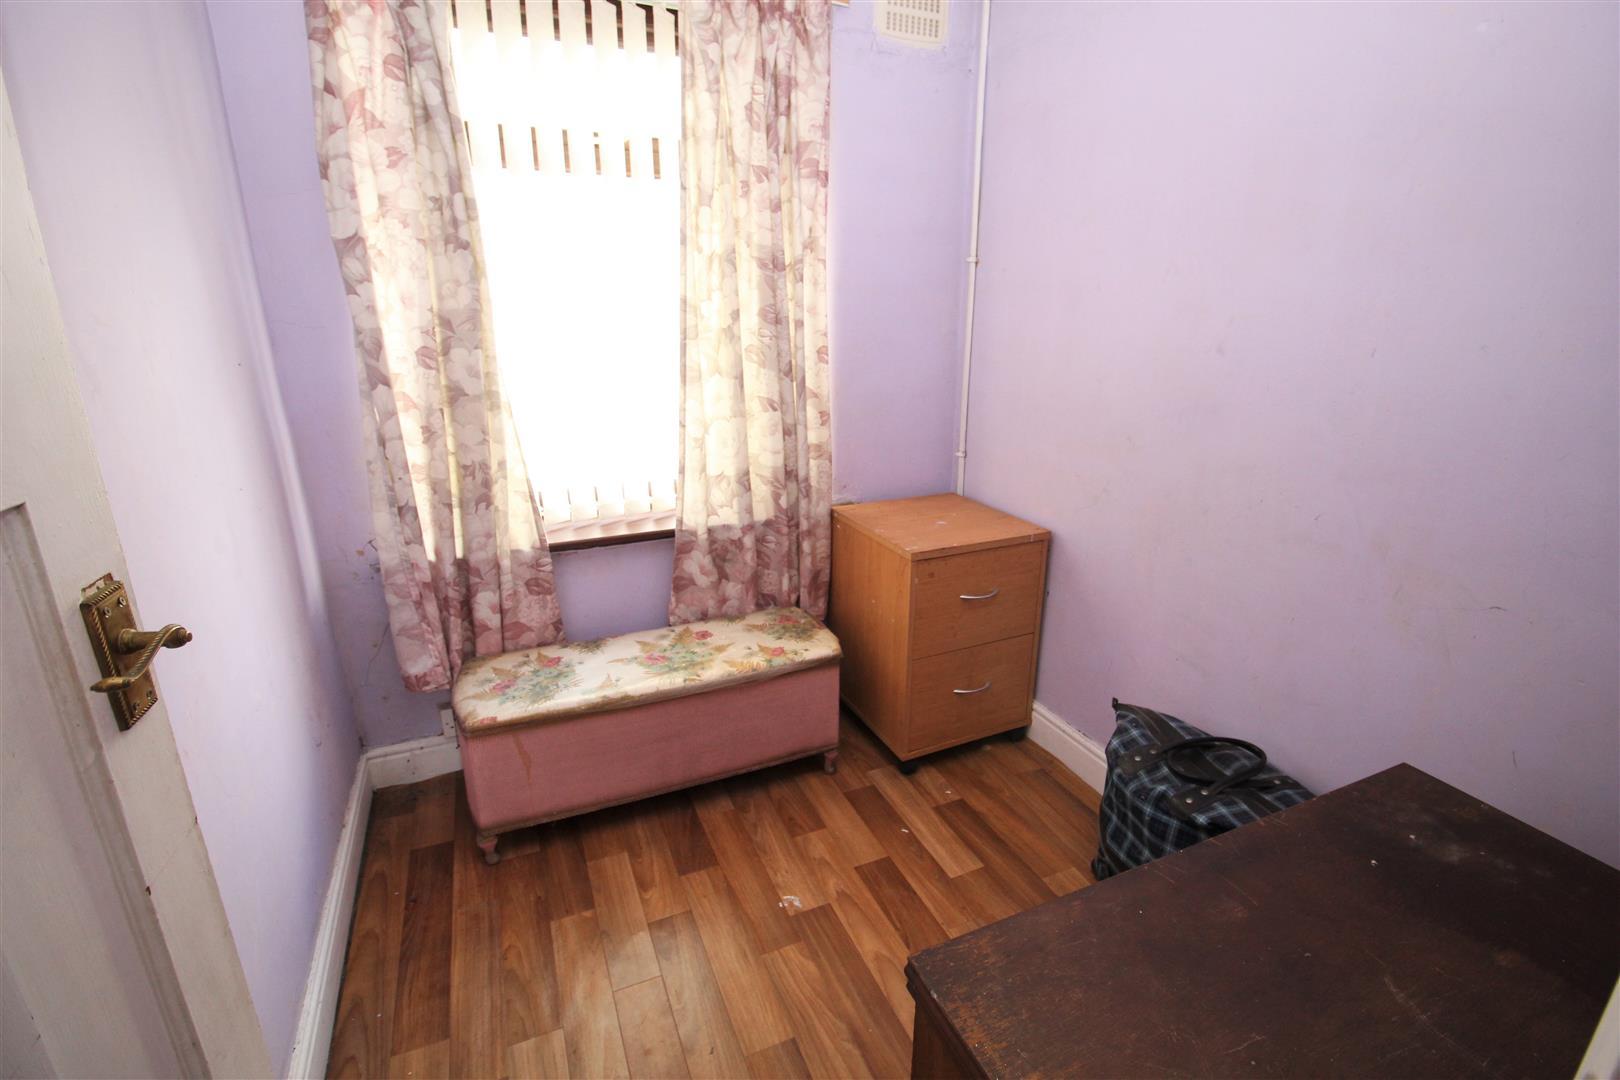 3 Bedrooms, House - Semi-Detached, Wheatley Avenue, Bootle